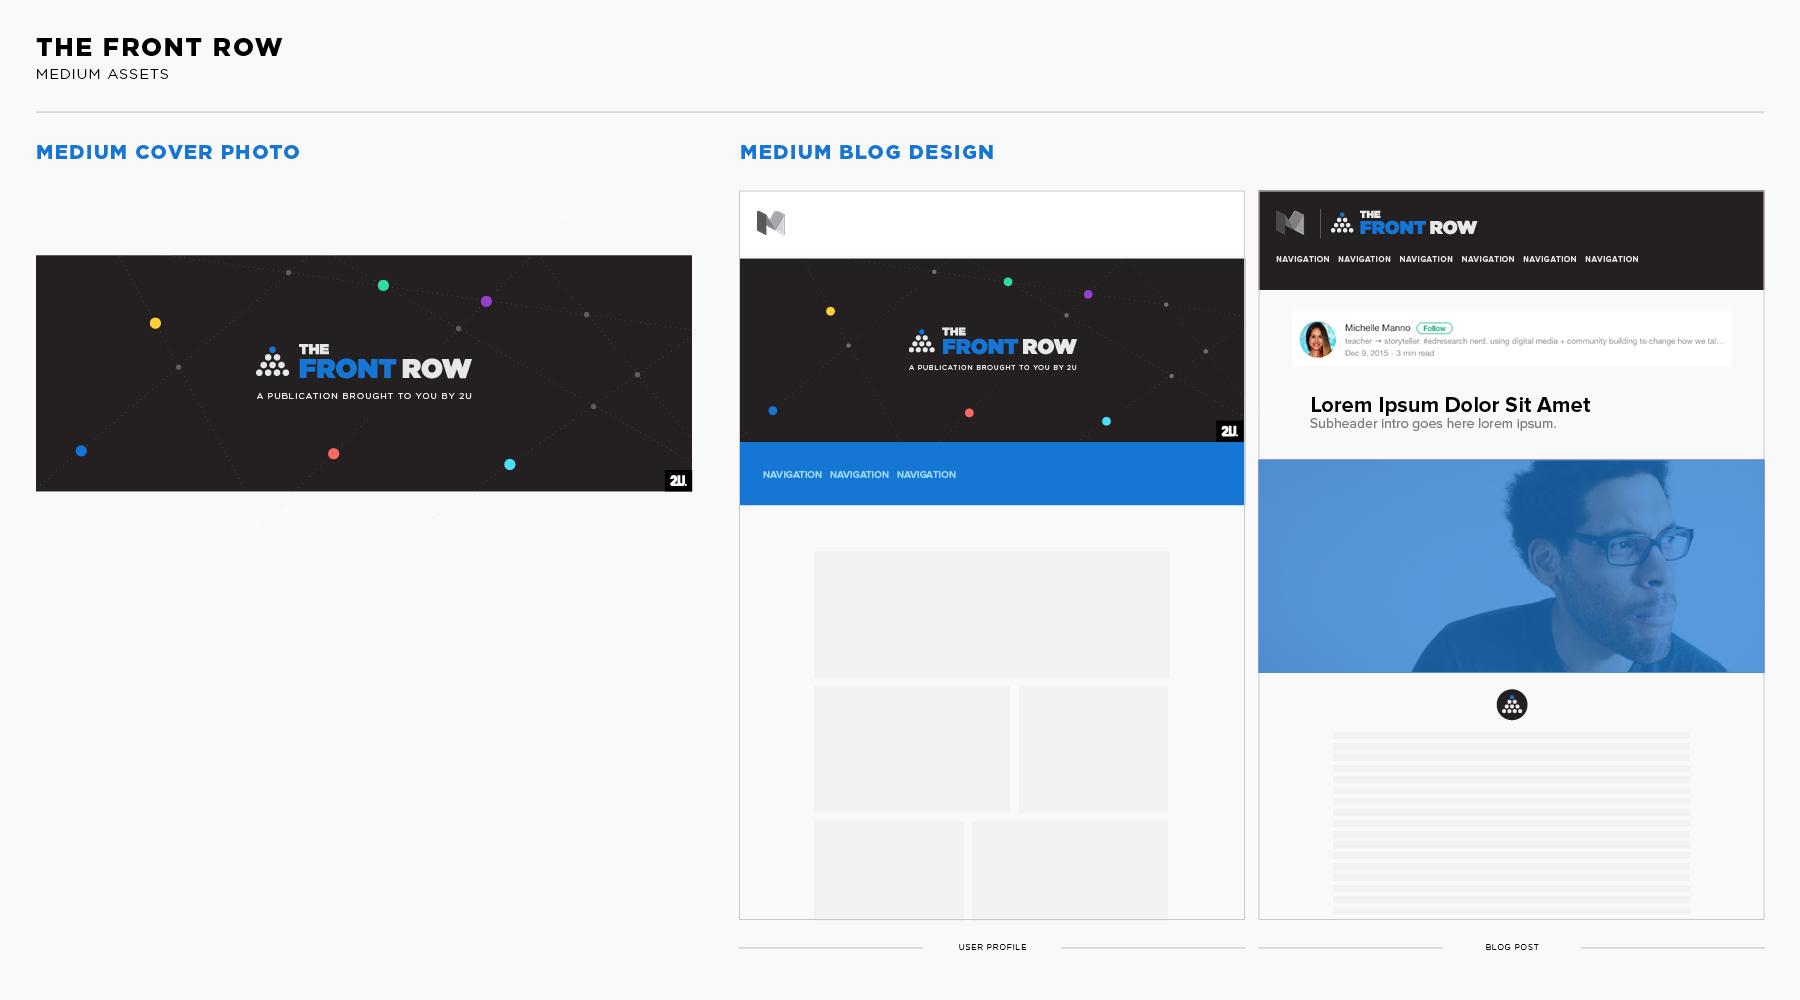 Medium Blog Design